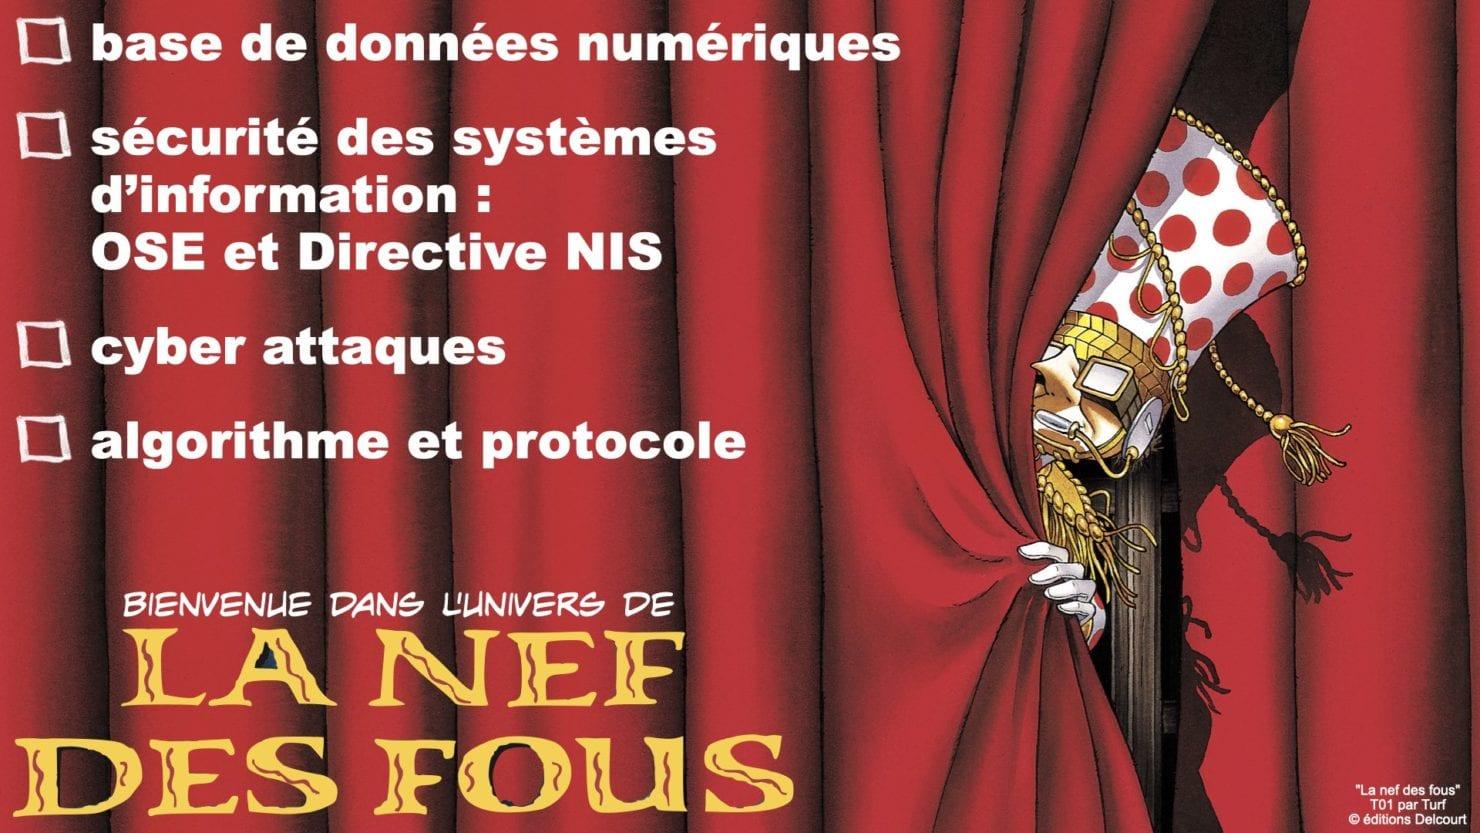 337 cyber sécurité #1 OIV OSE Critical Entities © Ledieu-avocat 15-06-2021.007